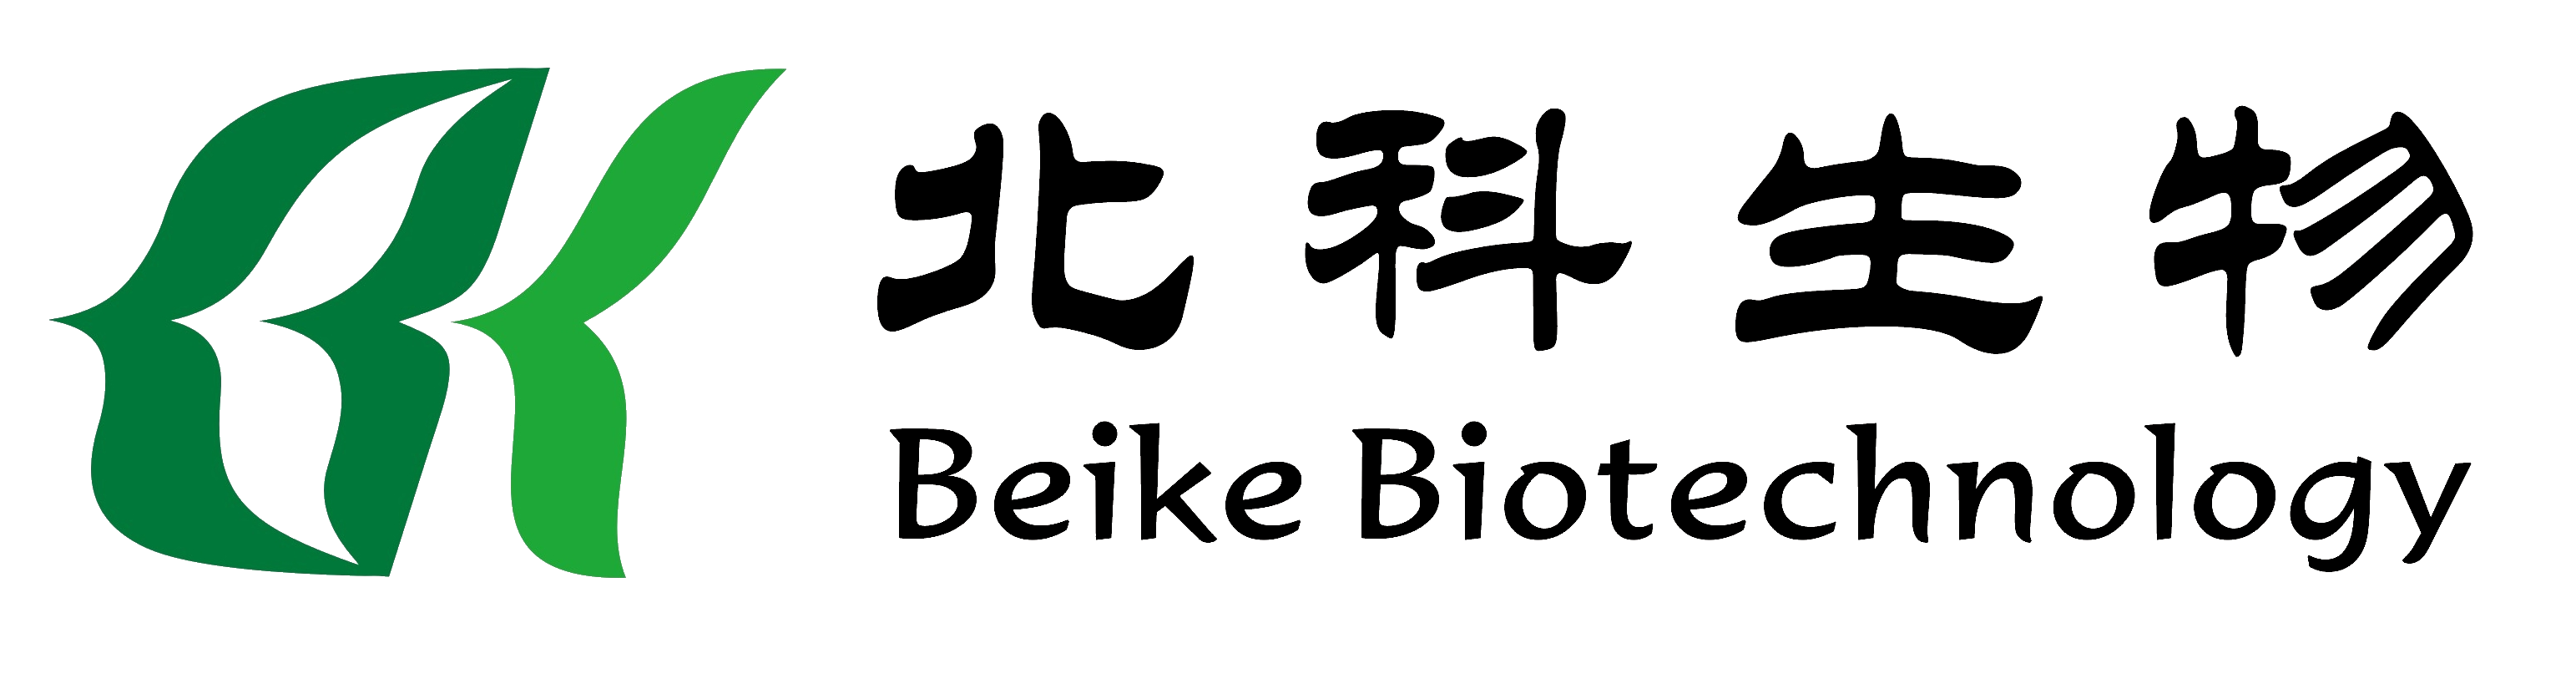 Beike Biotech